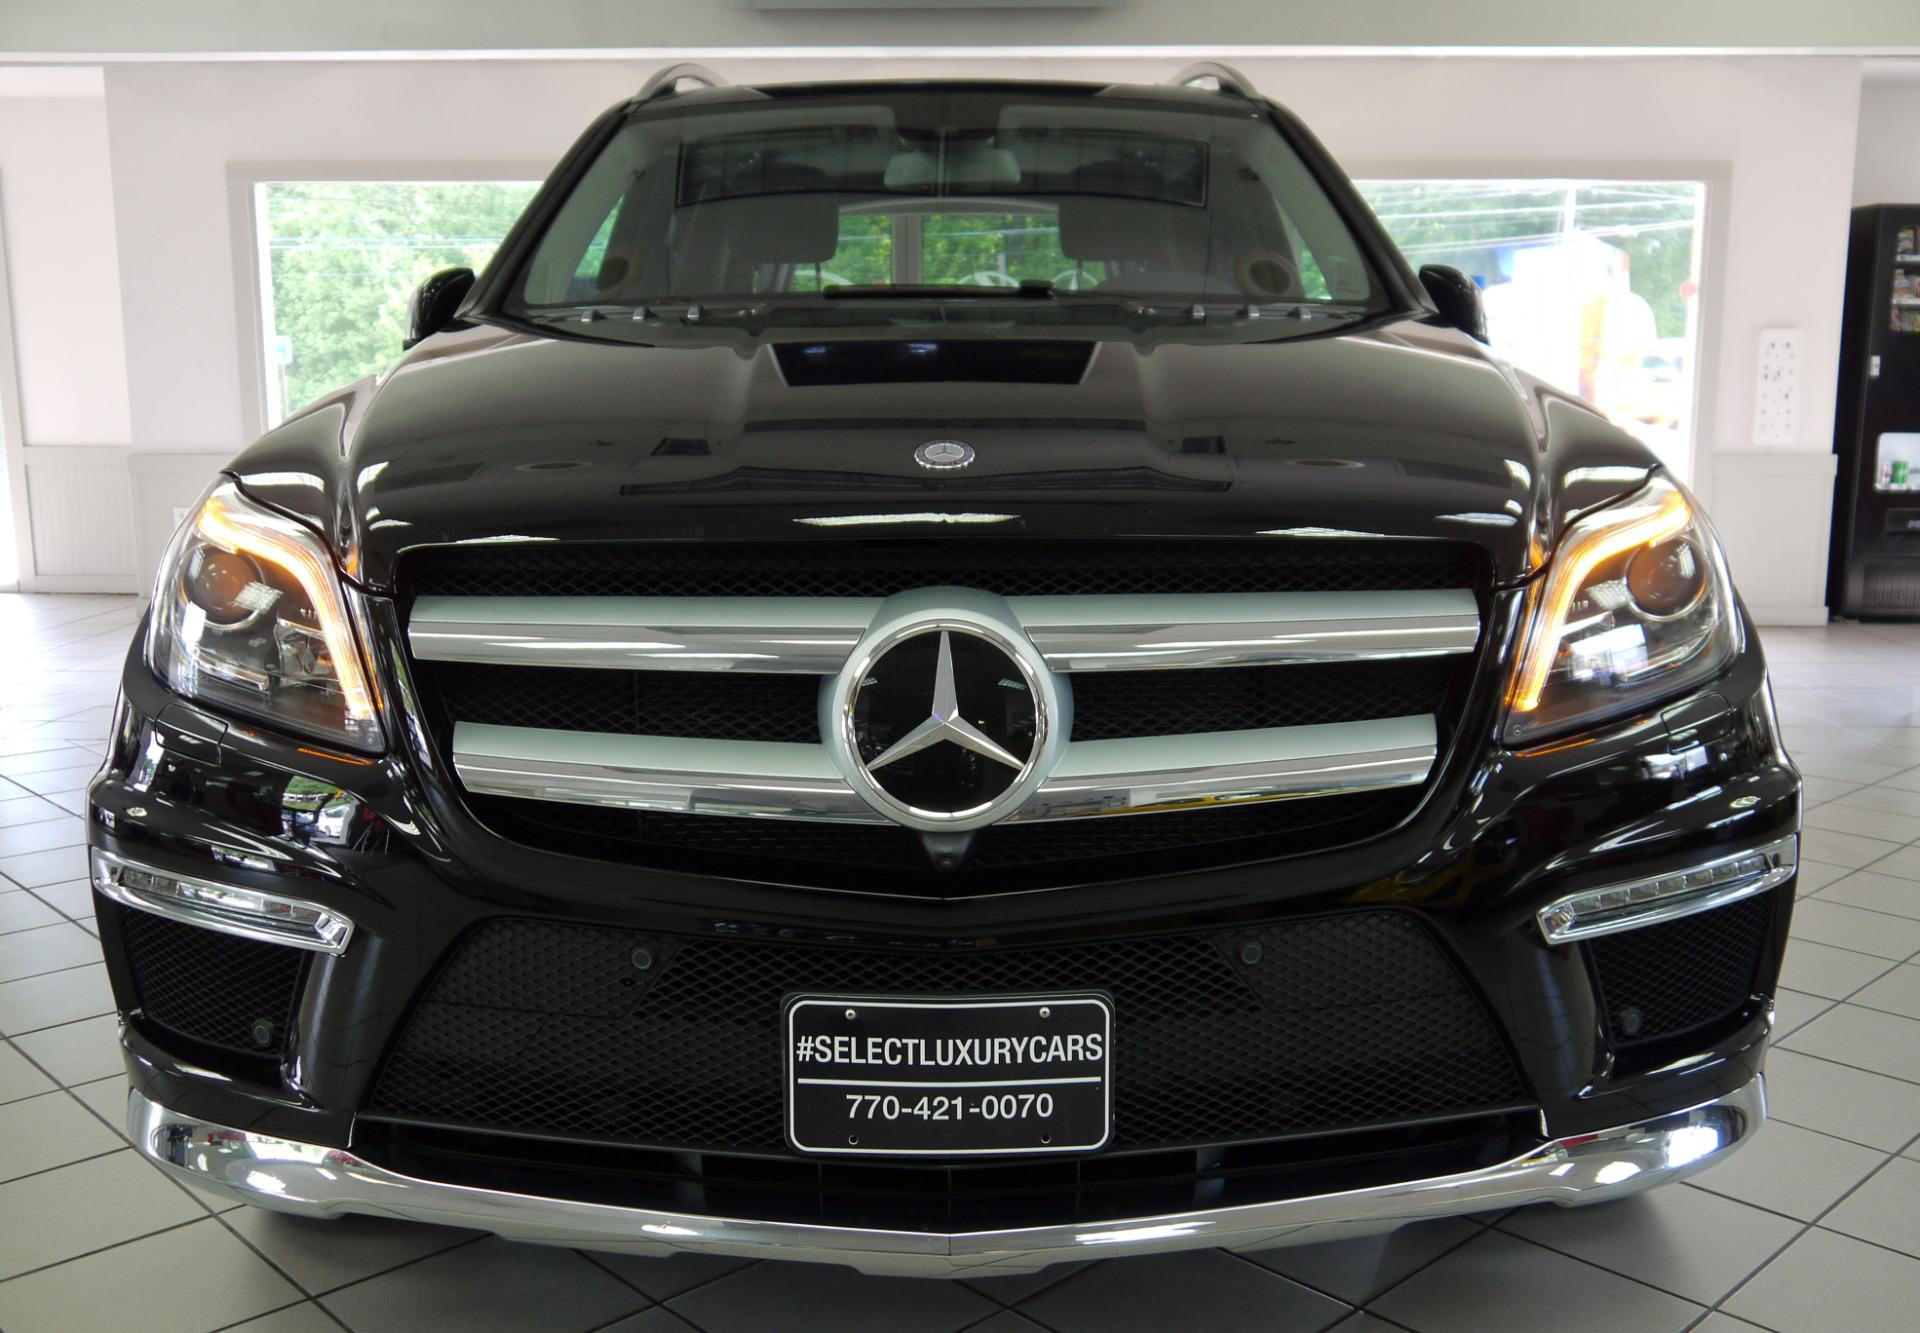 Used 2016 mercedes benz gl class gl550 marietta ga for Mercedes benz gl550 used